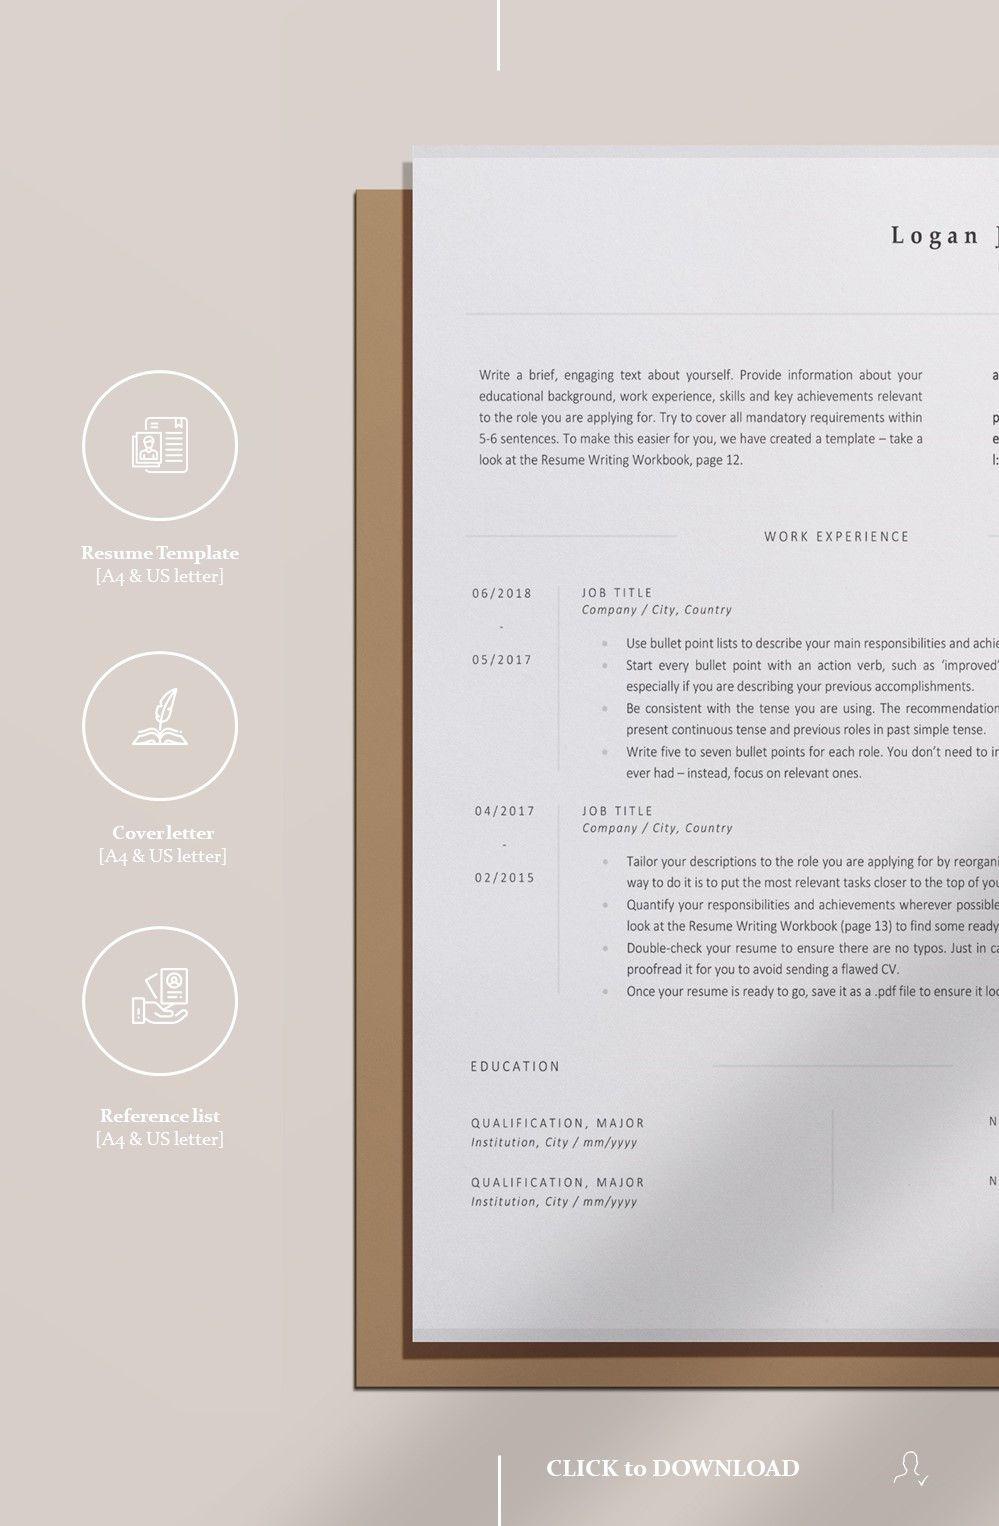 Minimalist Resume Template For Word Download Professional Resume Design Cv Design Inspiration Resume Tips Basic Resume Examples Resume Template